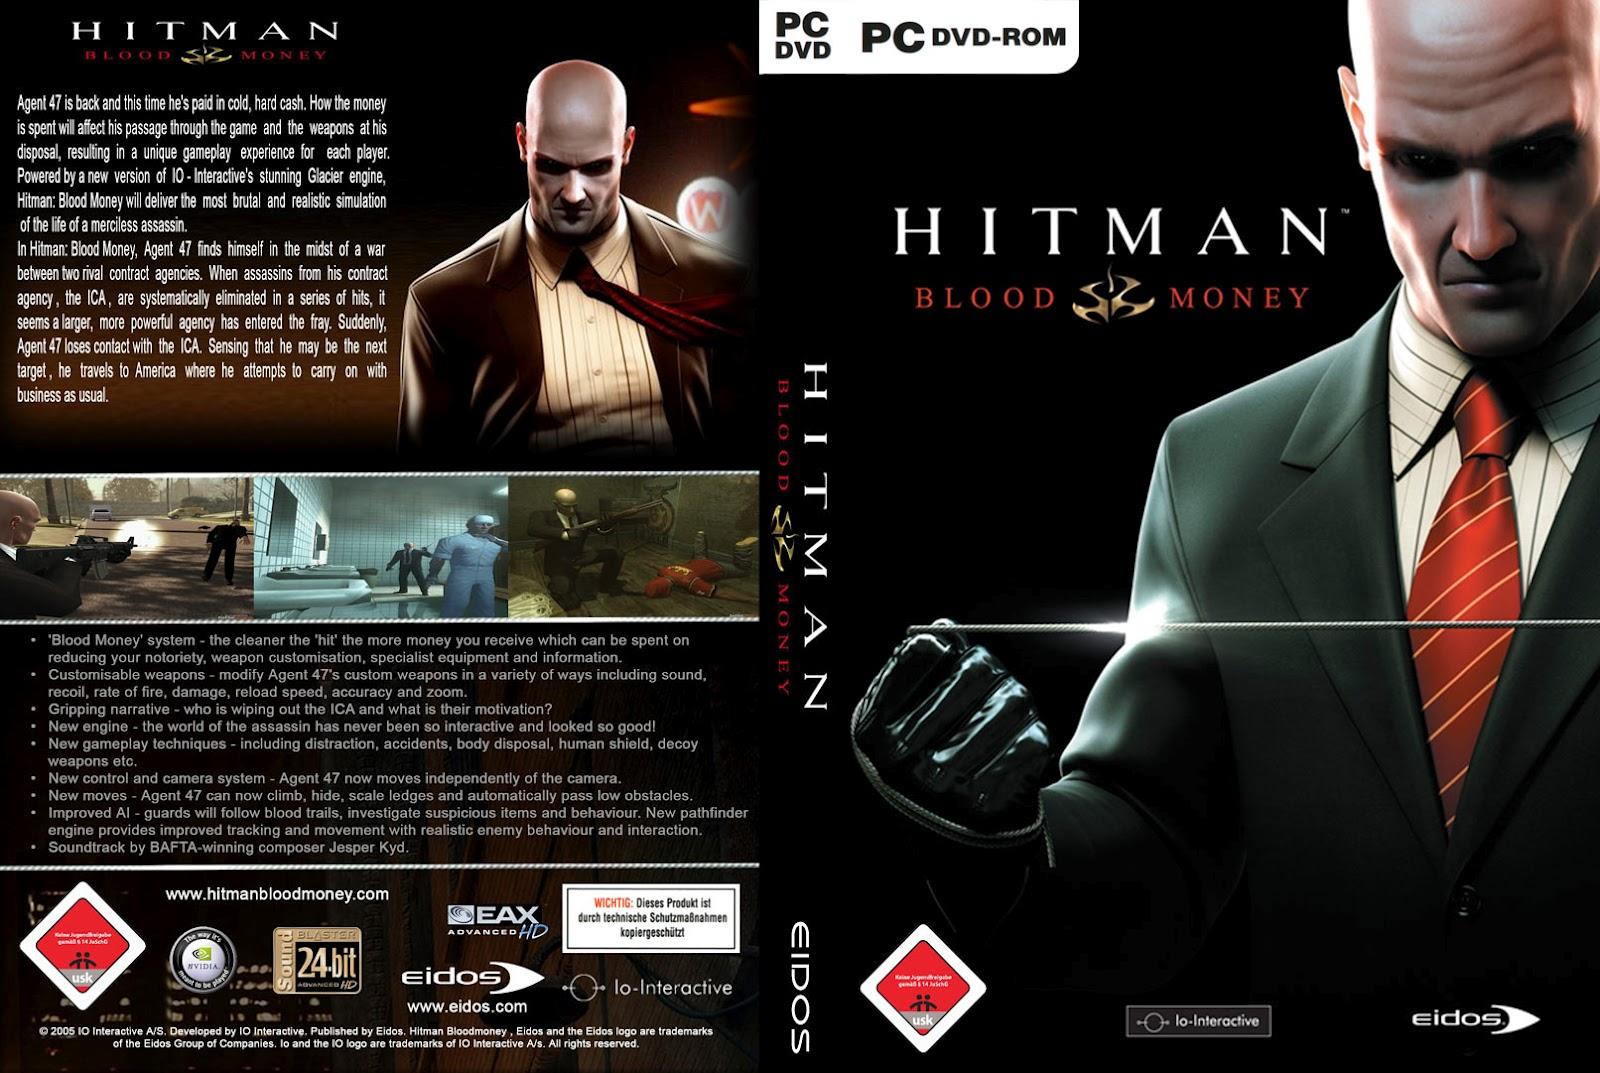 Hitman blood money download